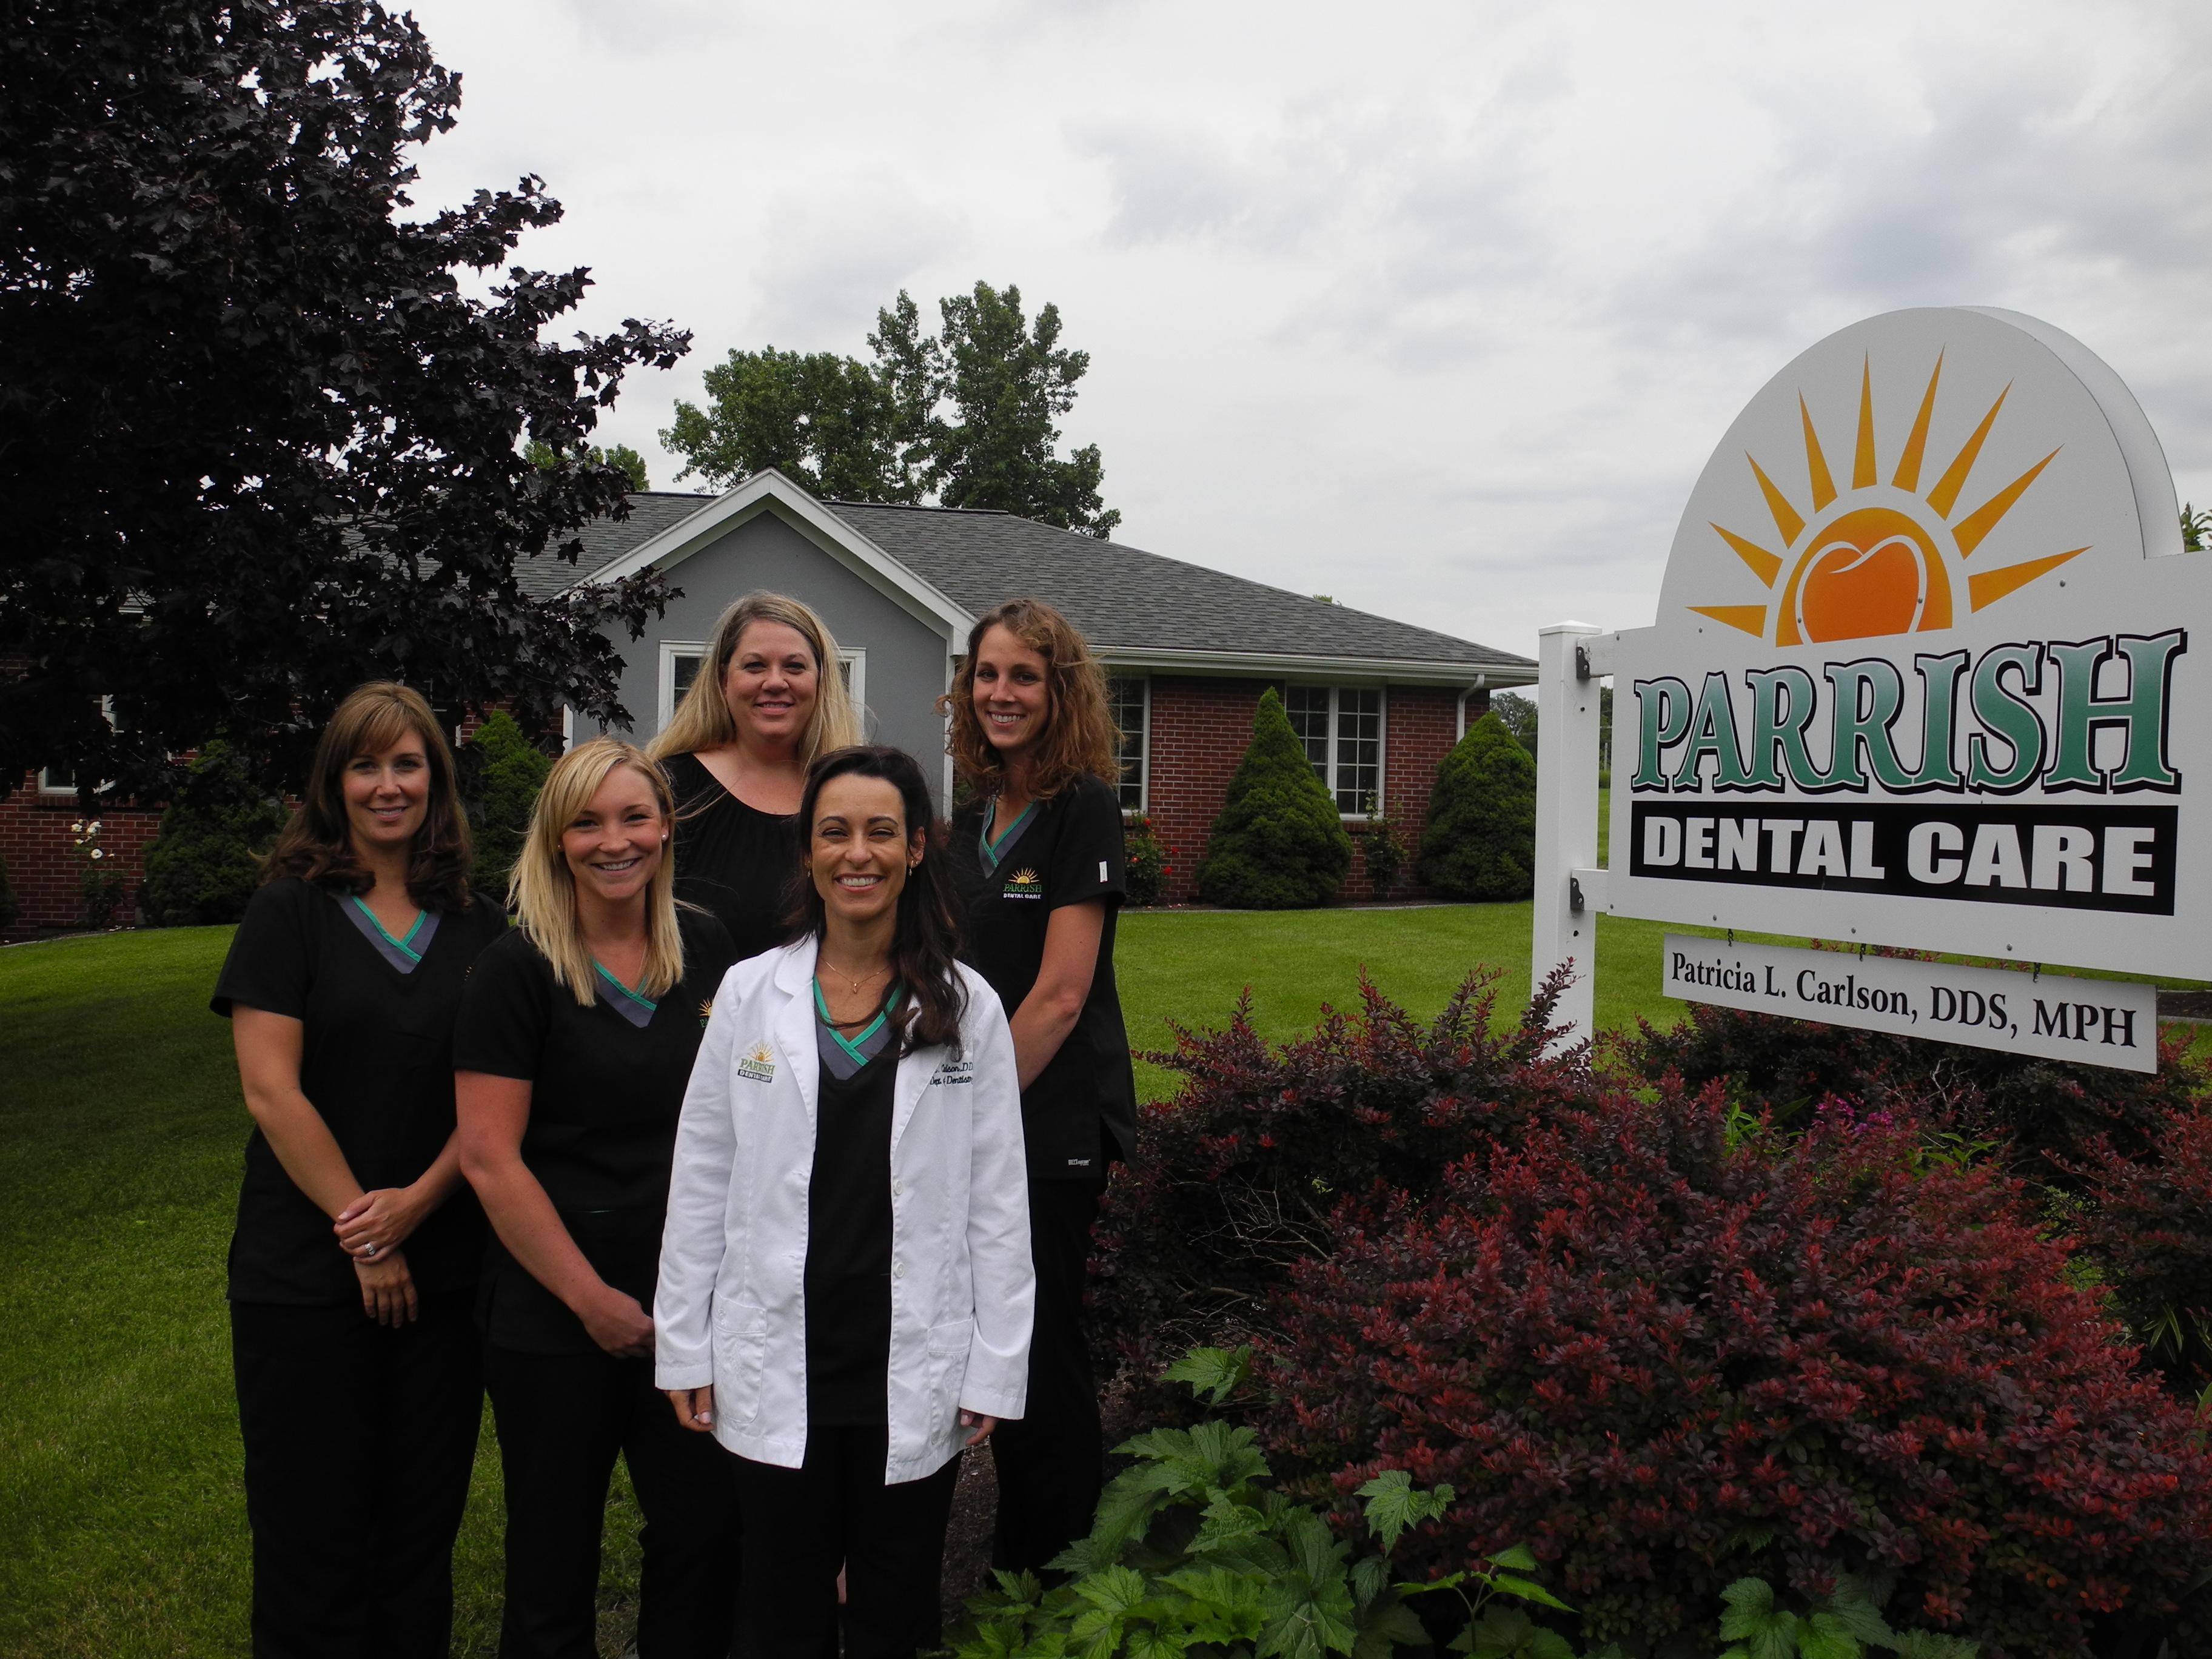 Parrish Dental Care -  Patricia Carlson DDS- Patricia L.Carlson  DDS,MPH image 2